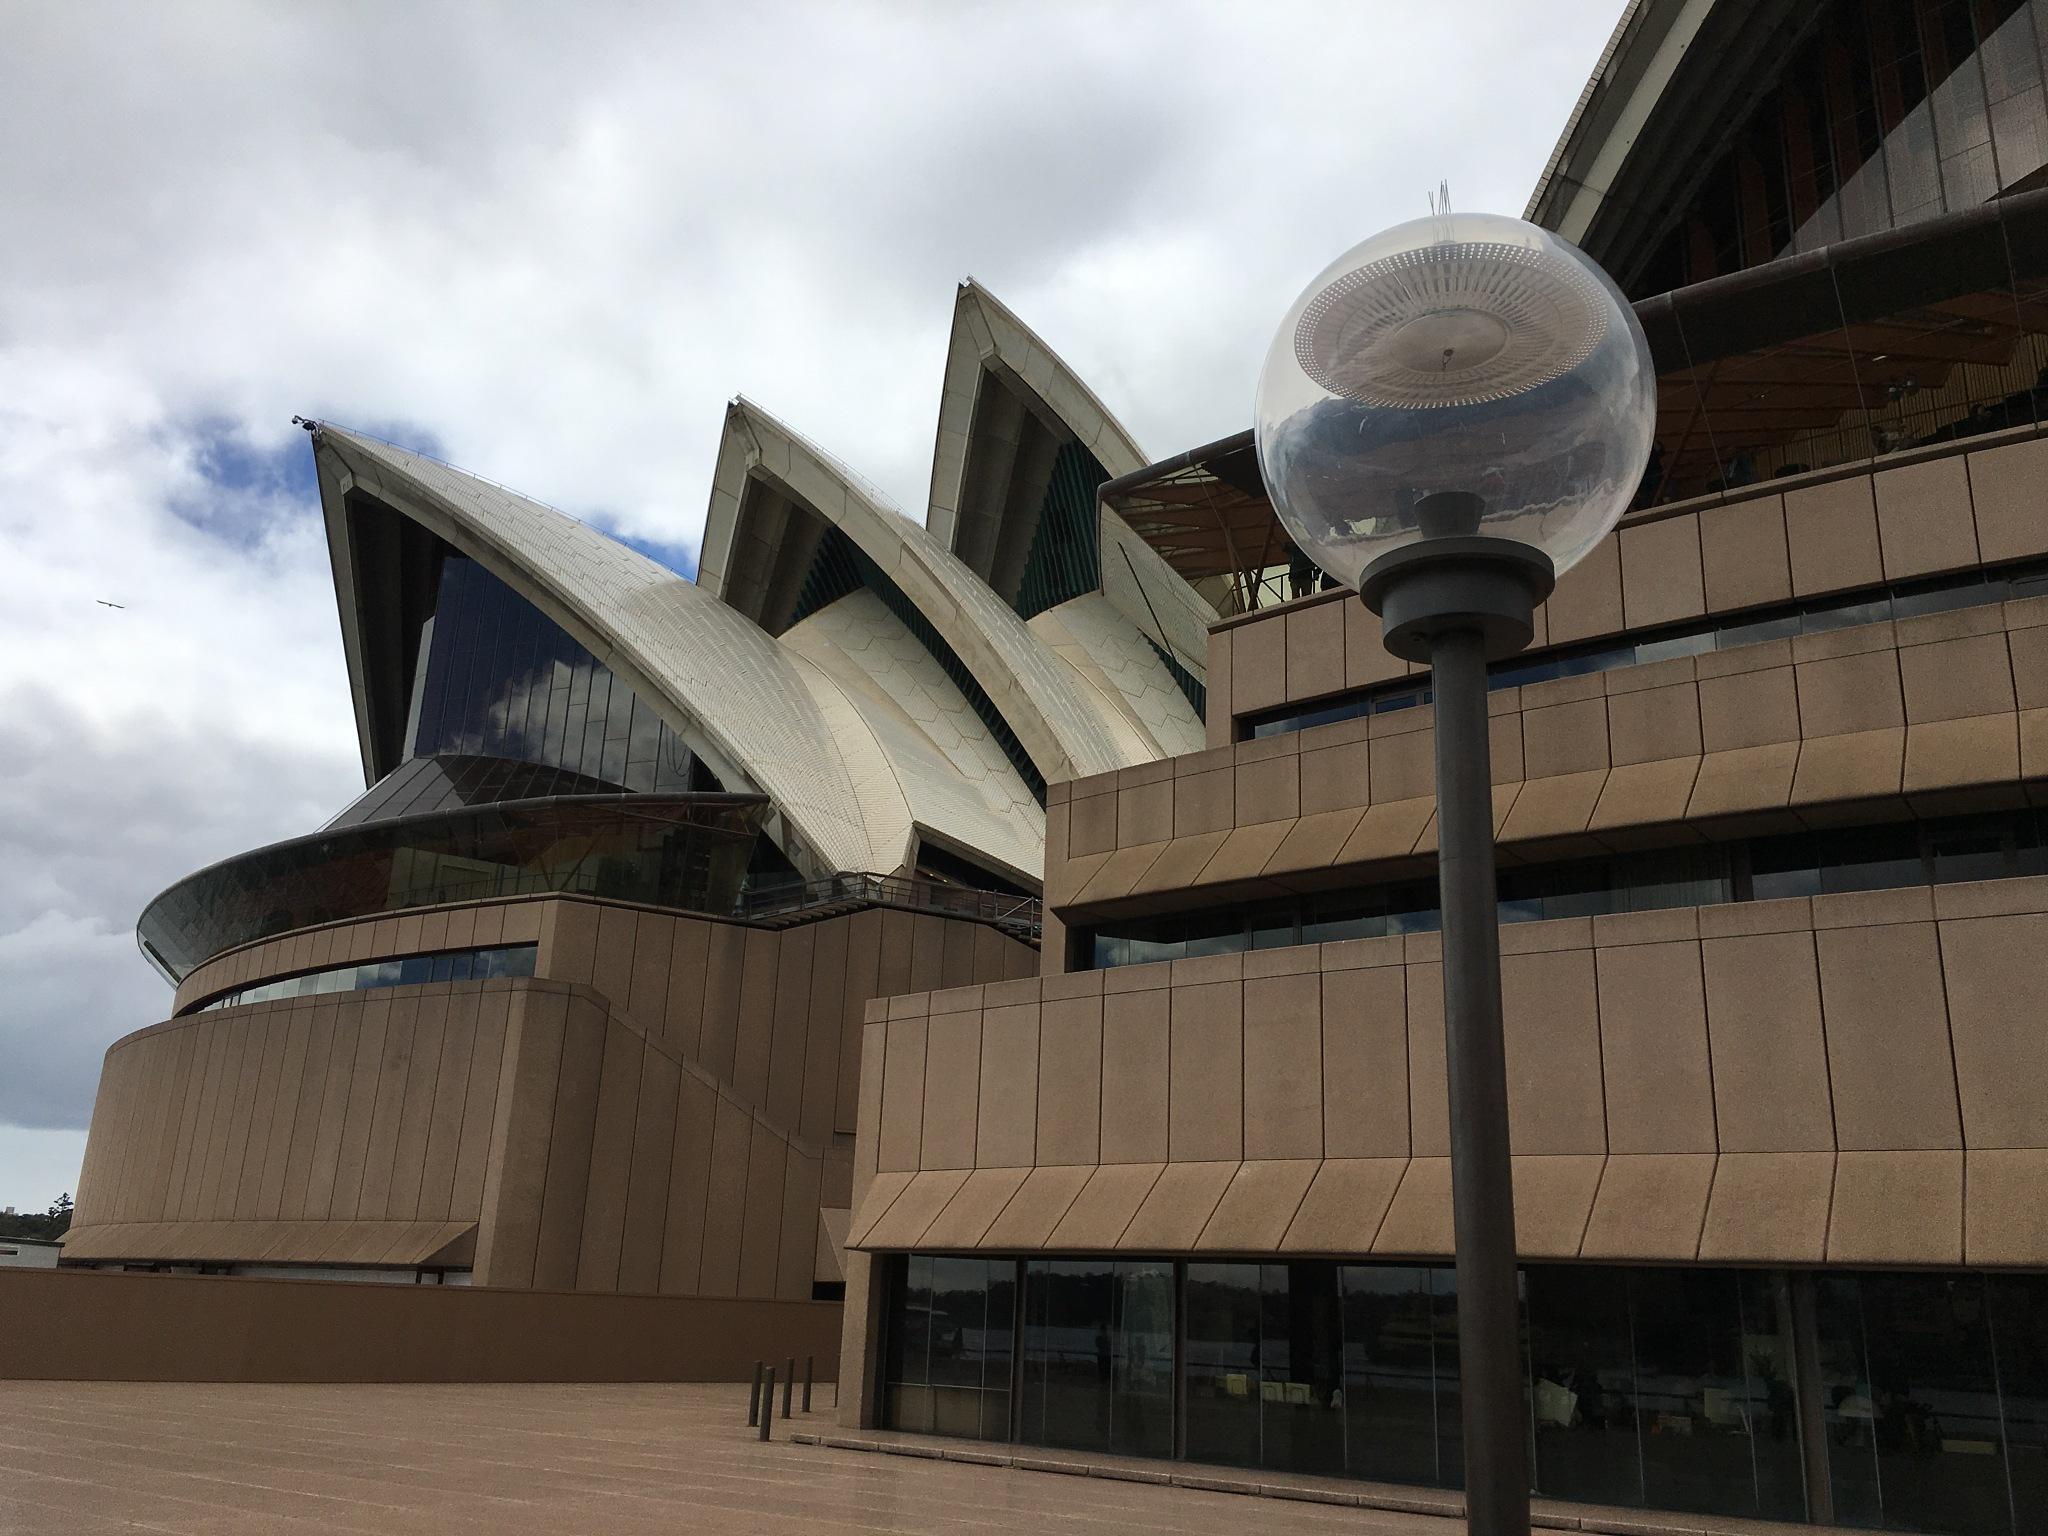 Opera House by ronmac777